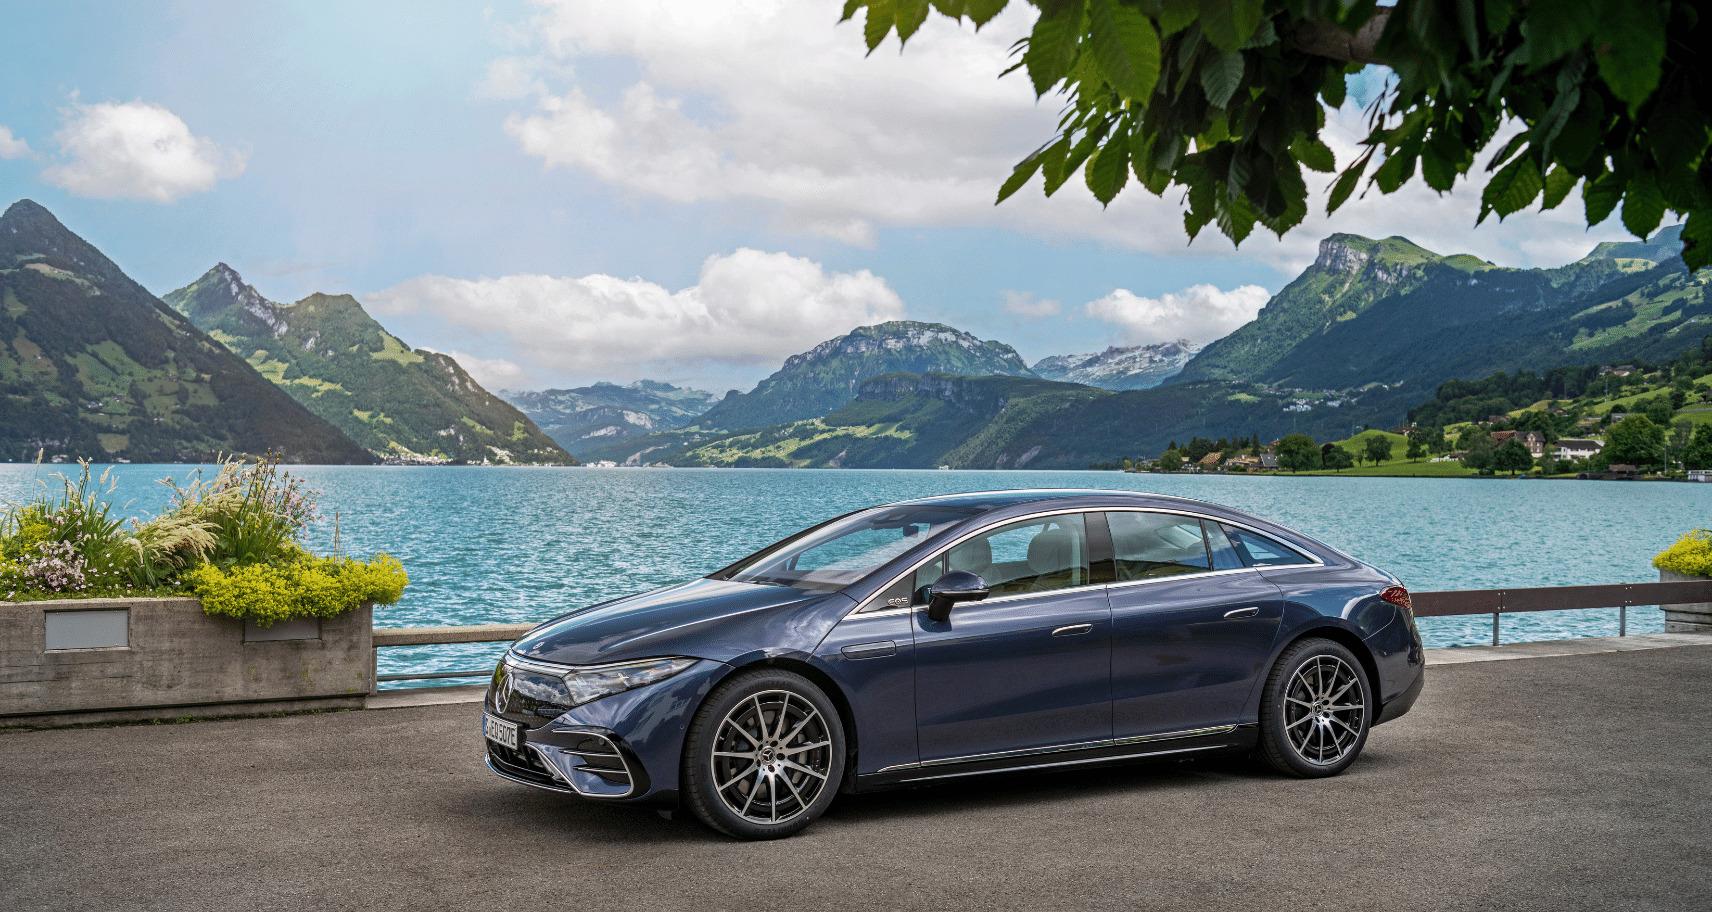 ercedes-Benz EQ recharge rapide